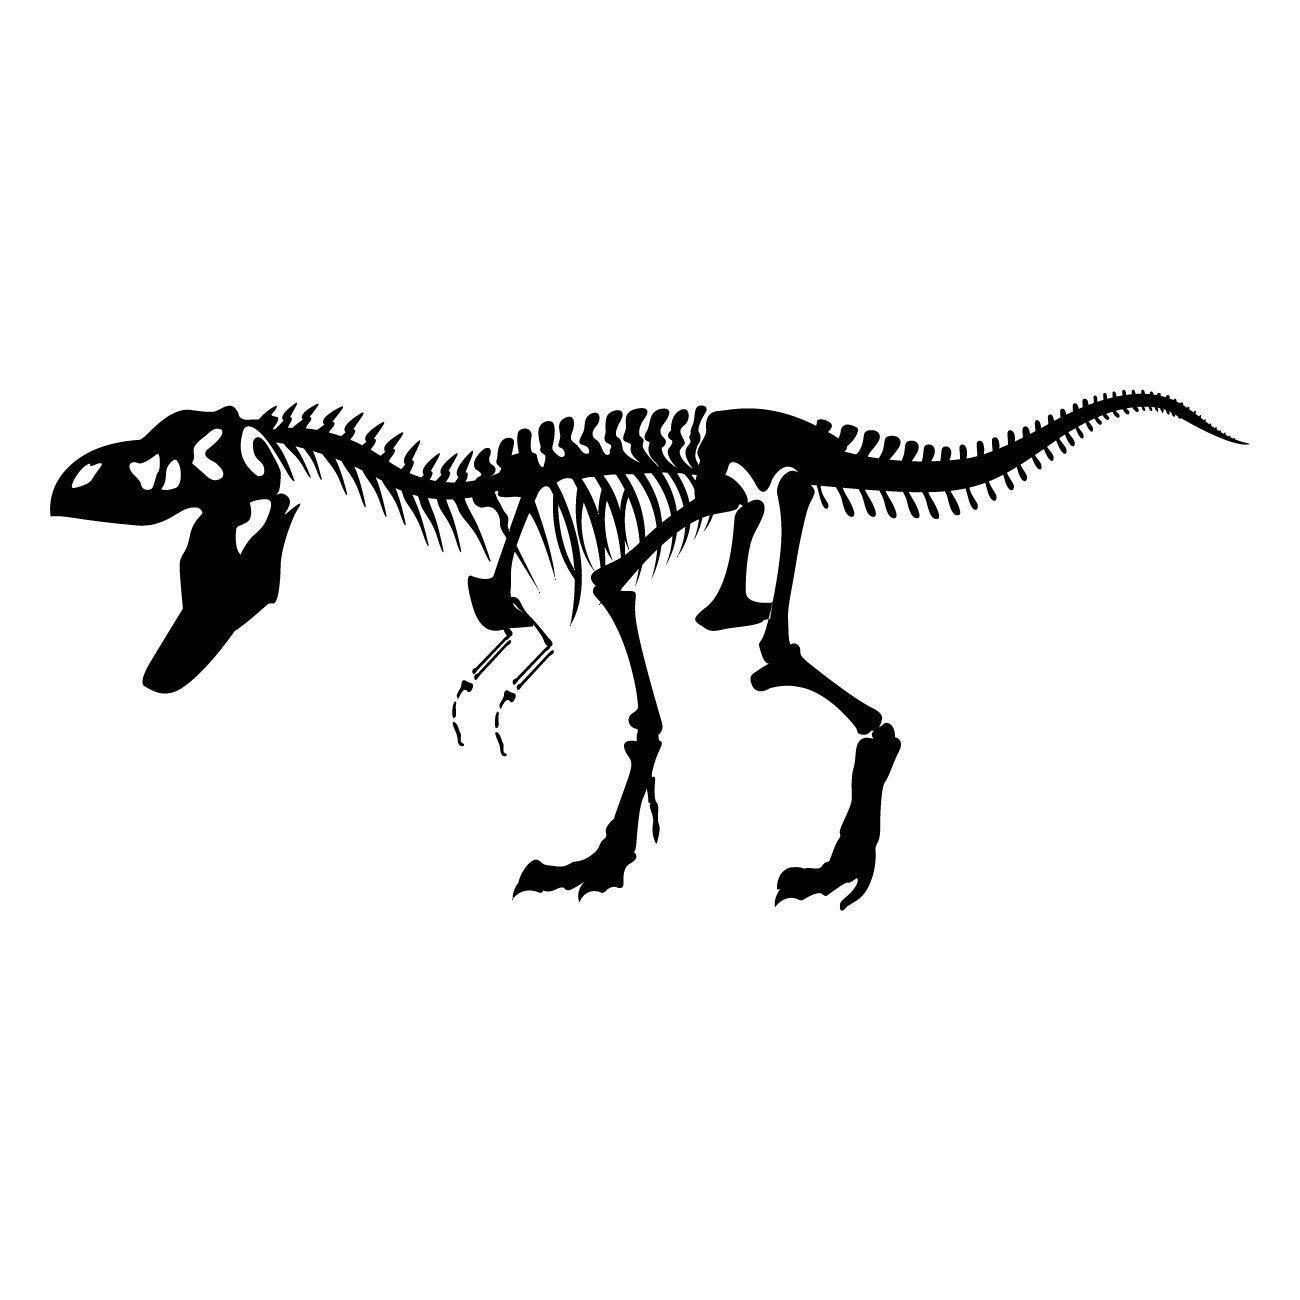 Details About Tyrannosaurus T Rex Dinosaur Skeleton Wall